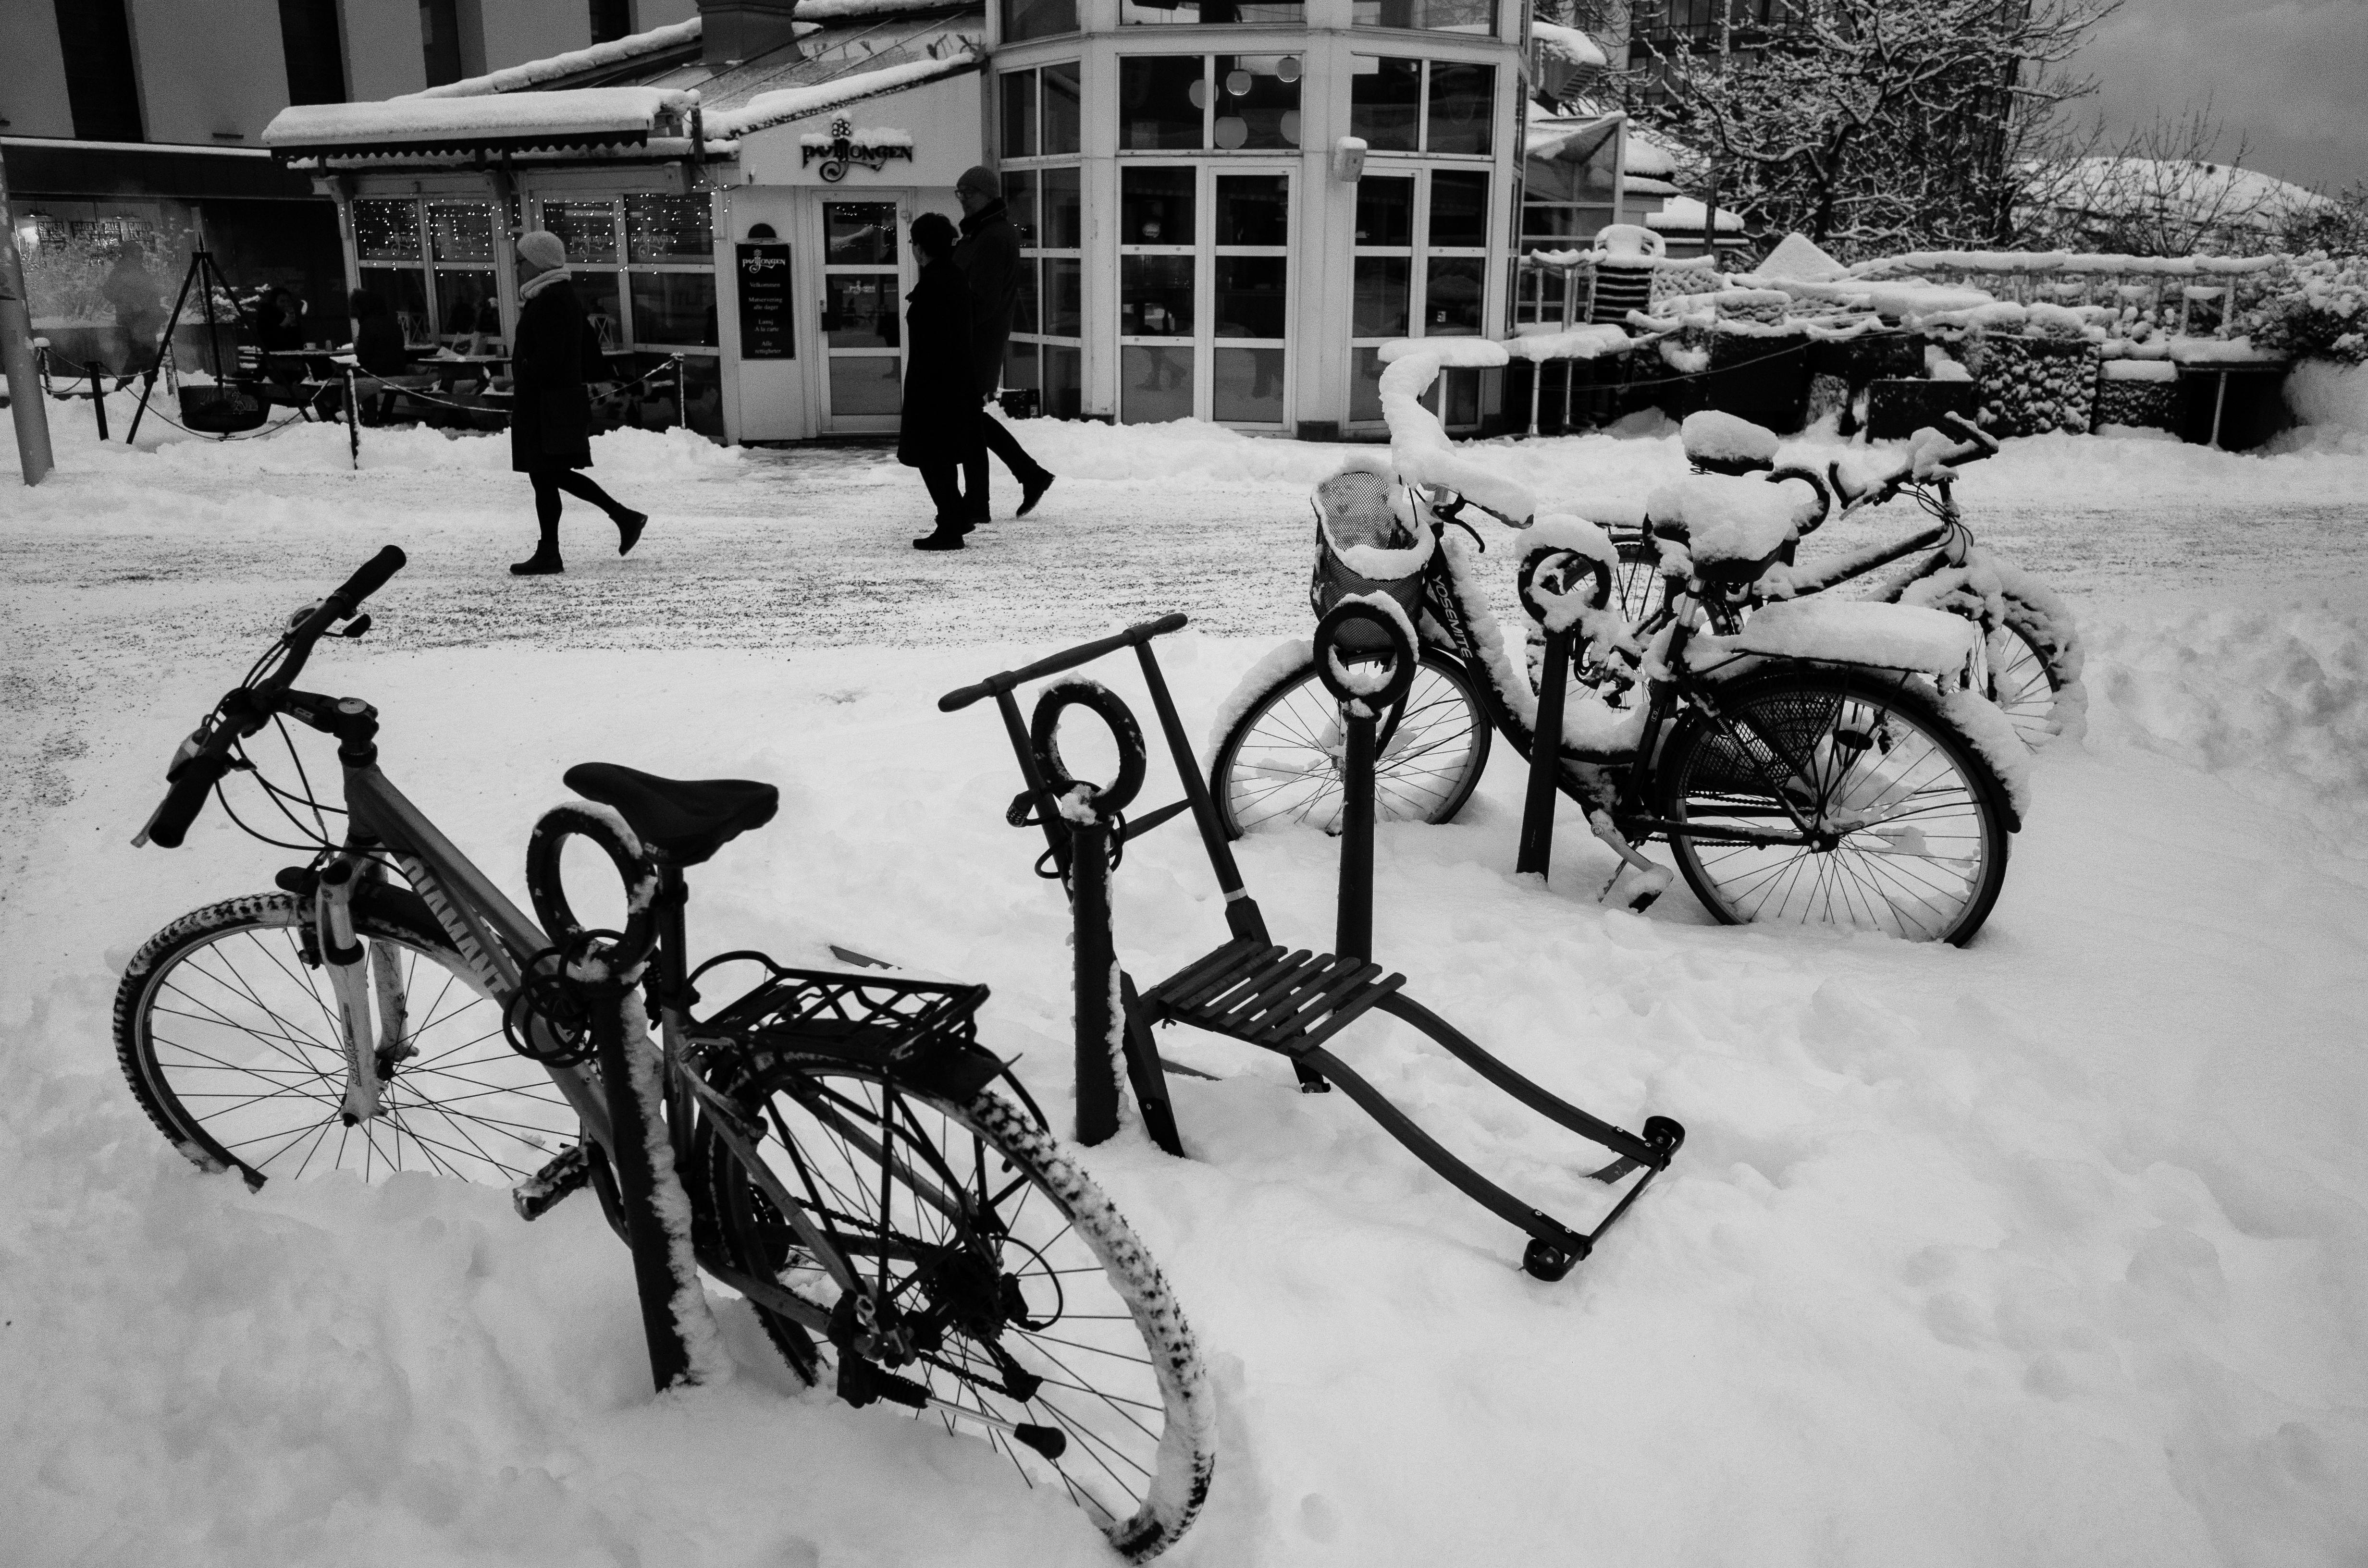 Kicksled & Bicycles in snow. Bodø, Norway, Bike, Black, Blackandwhite, GR, HQ Photo